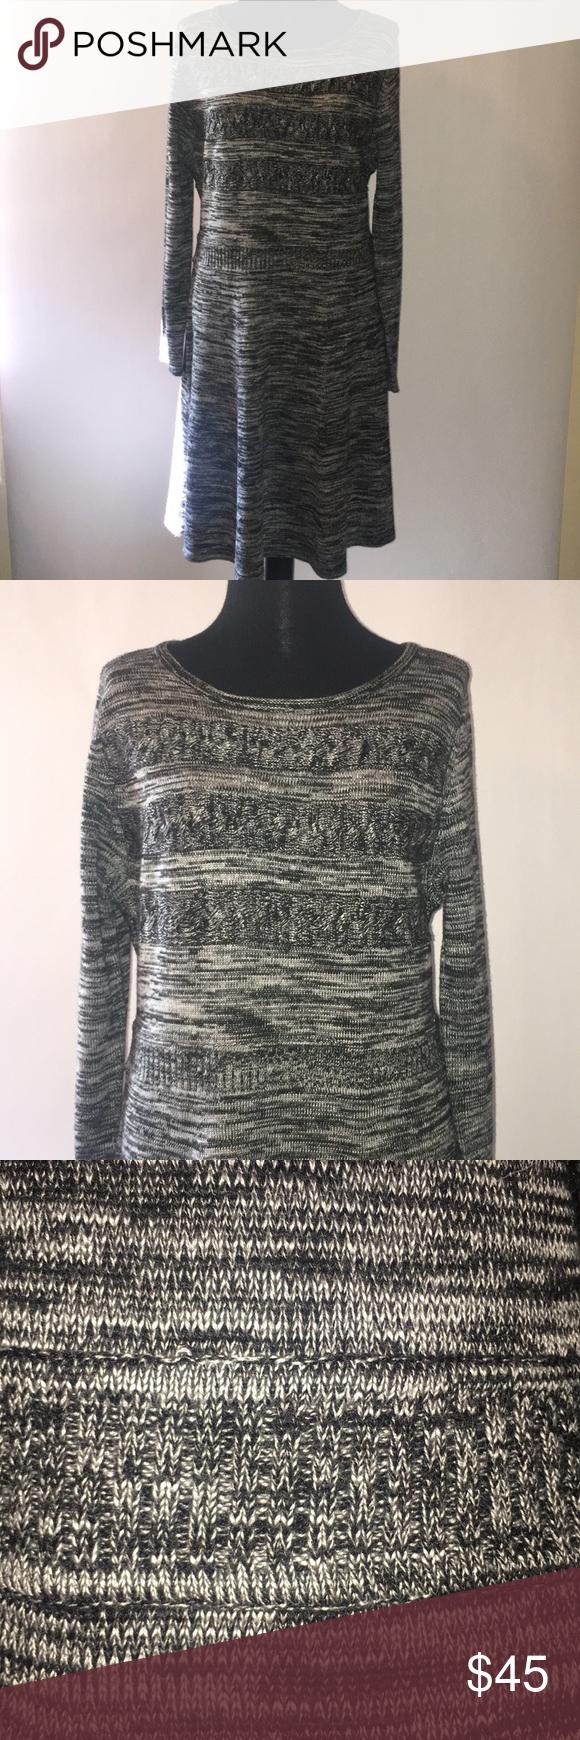 "987204cd61 Calvin Klein black white knit soft sweater dress • Approx 38"" long"